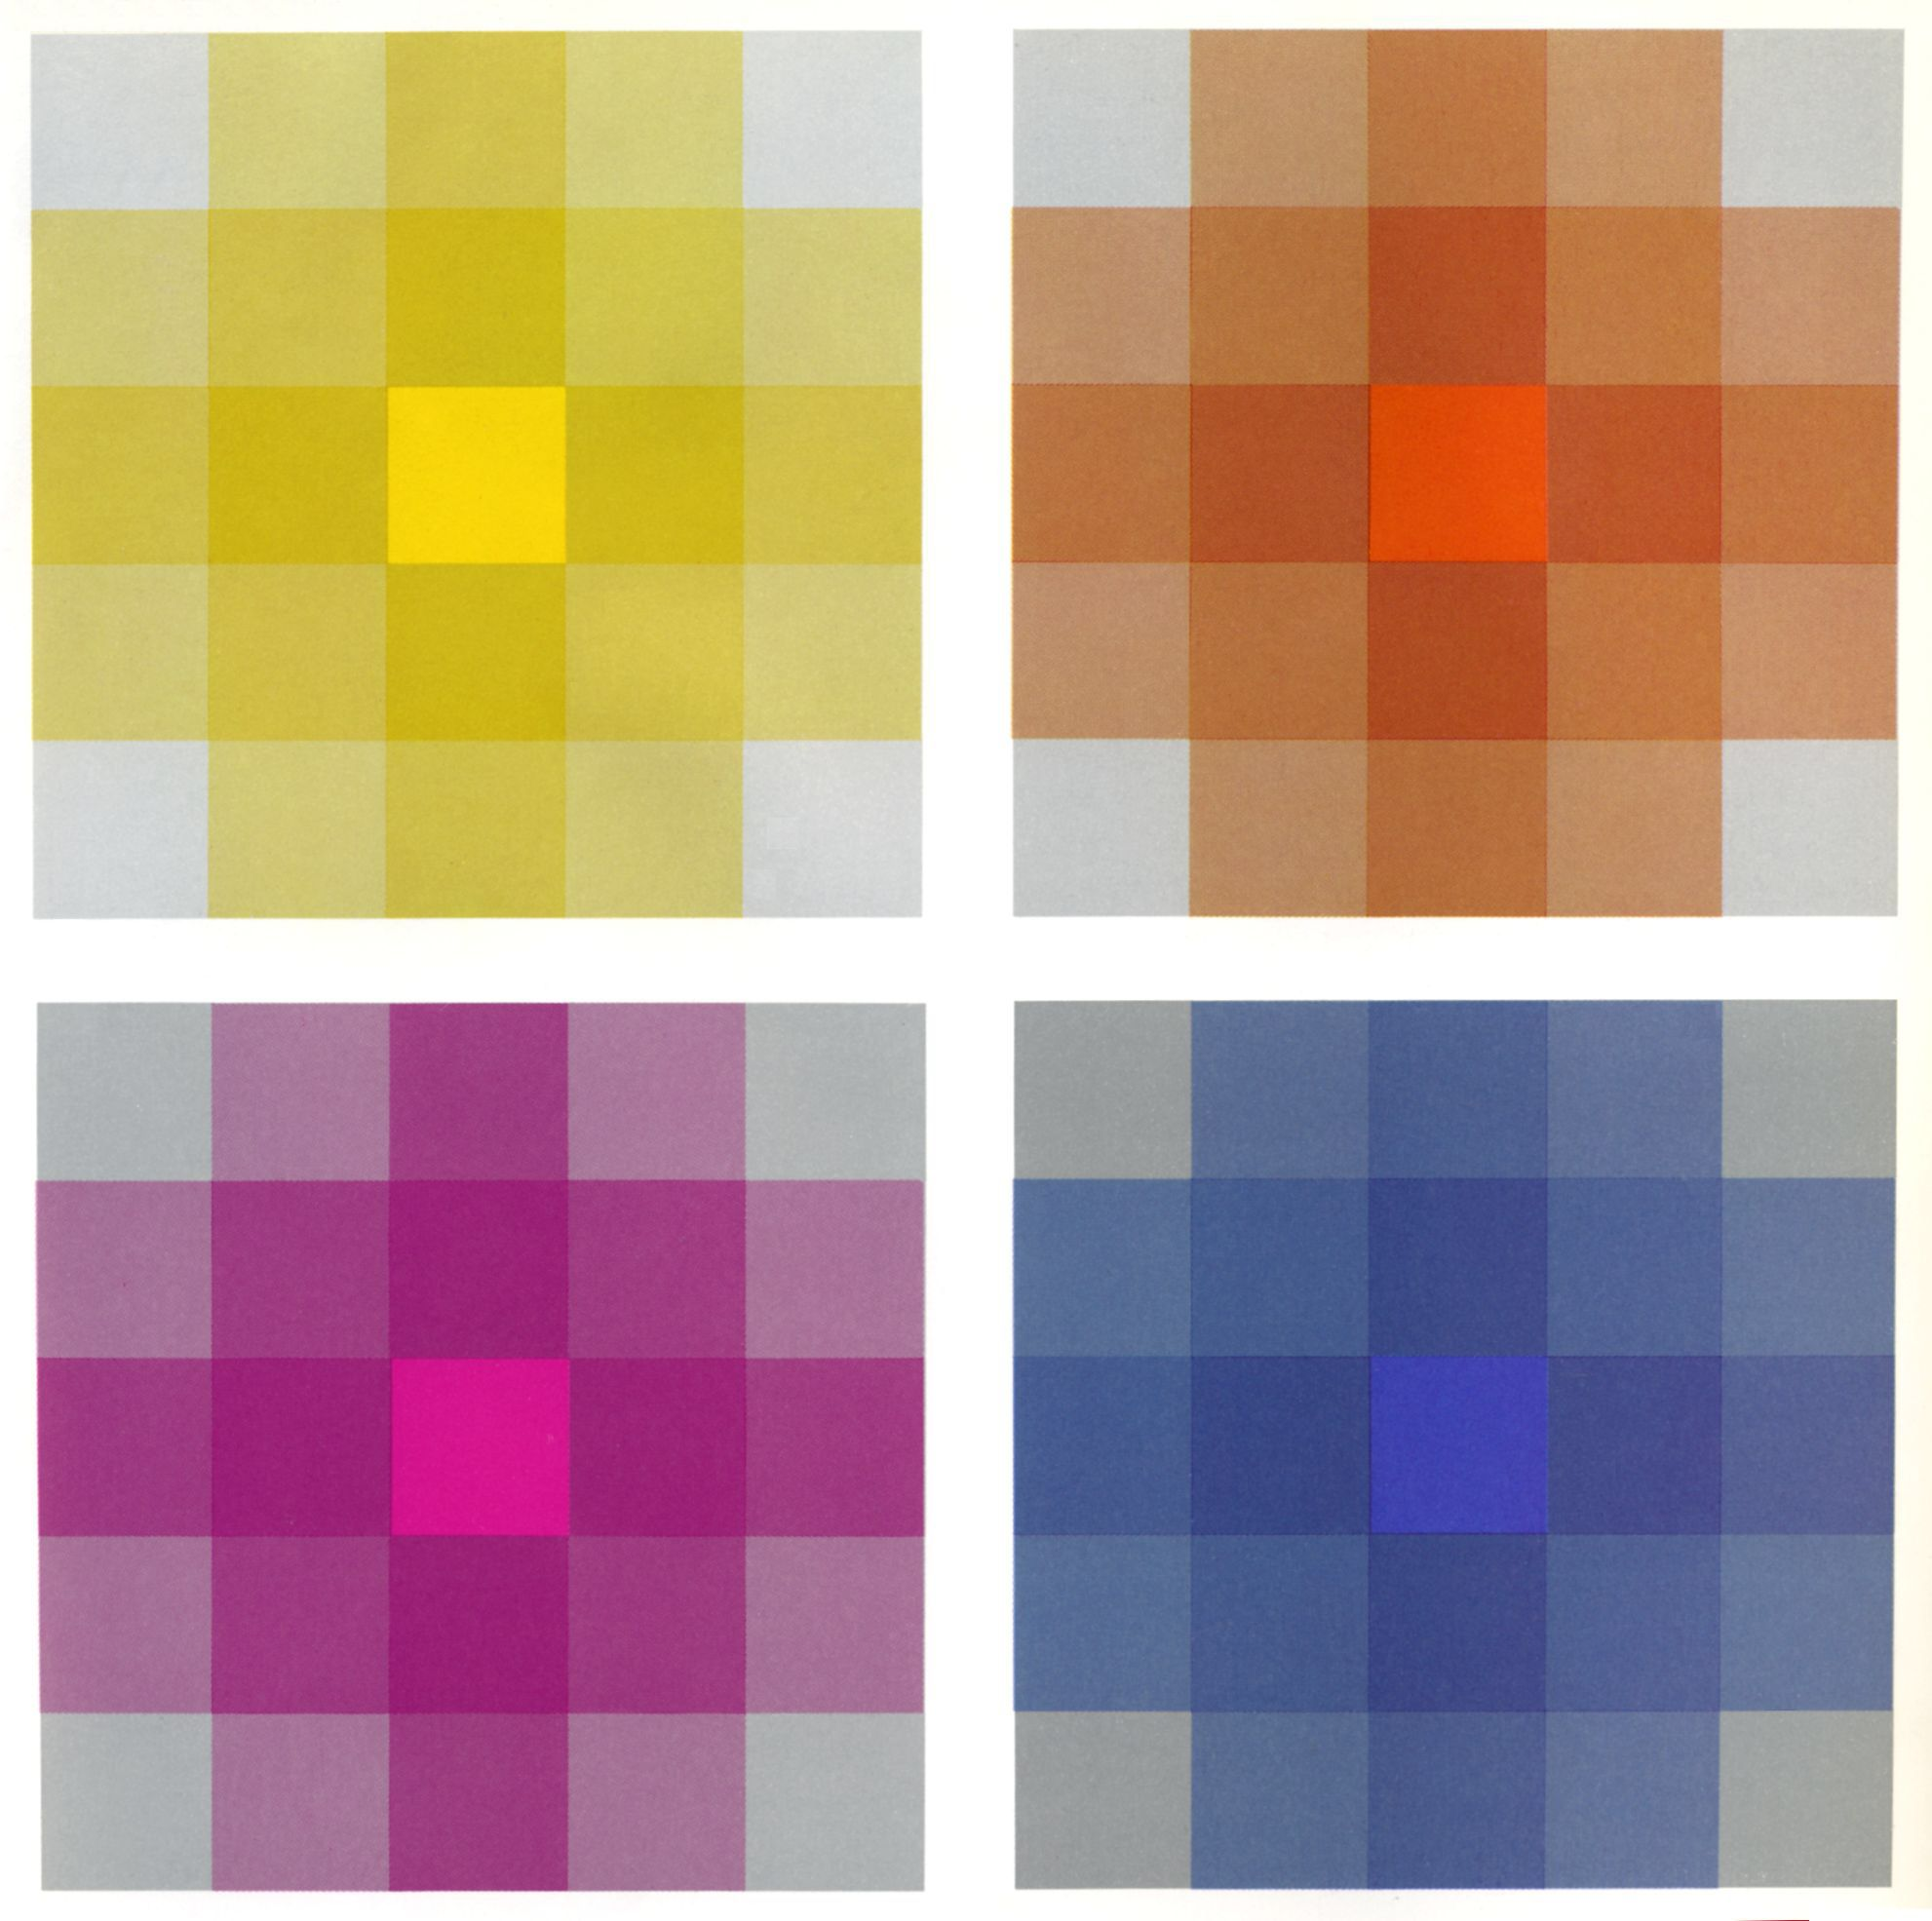 Kwaliteitscontrast | Kleur en Contrast | Pinterest